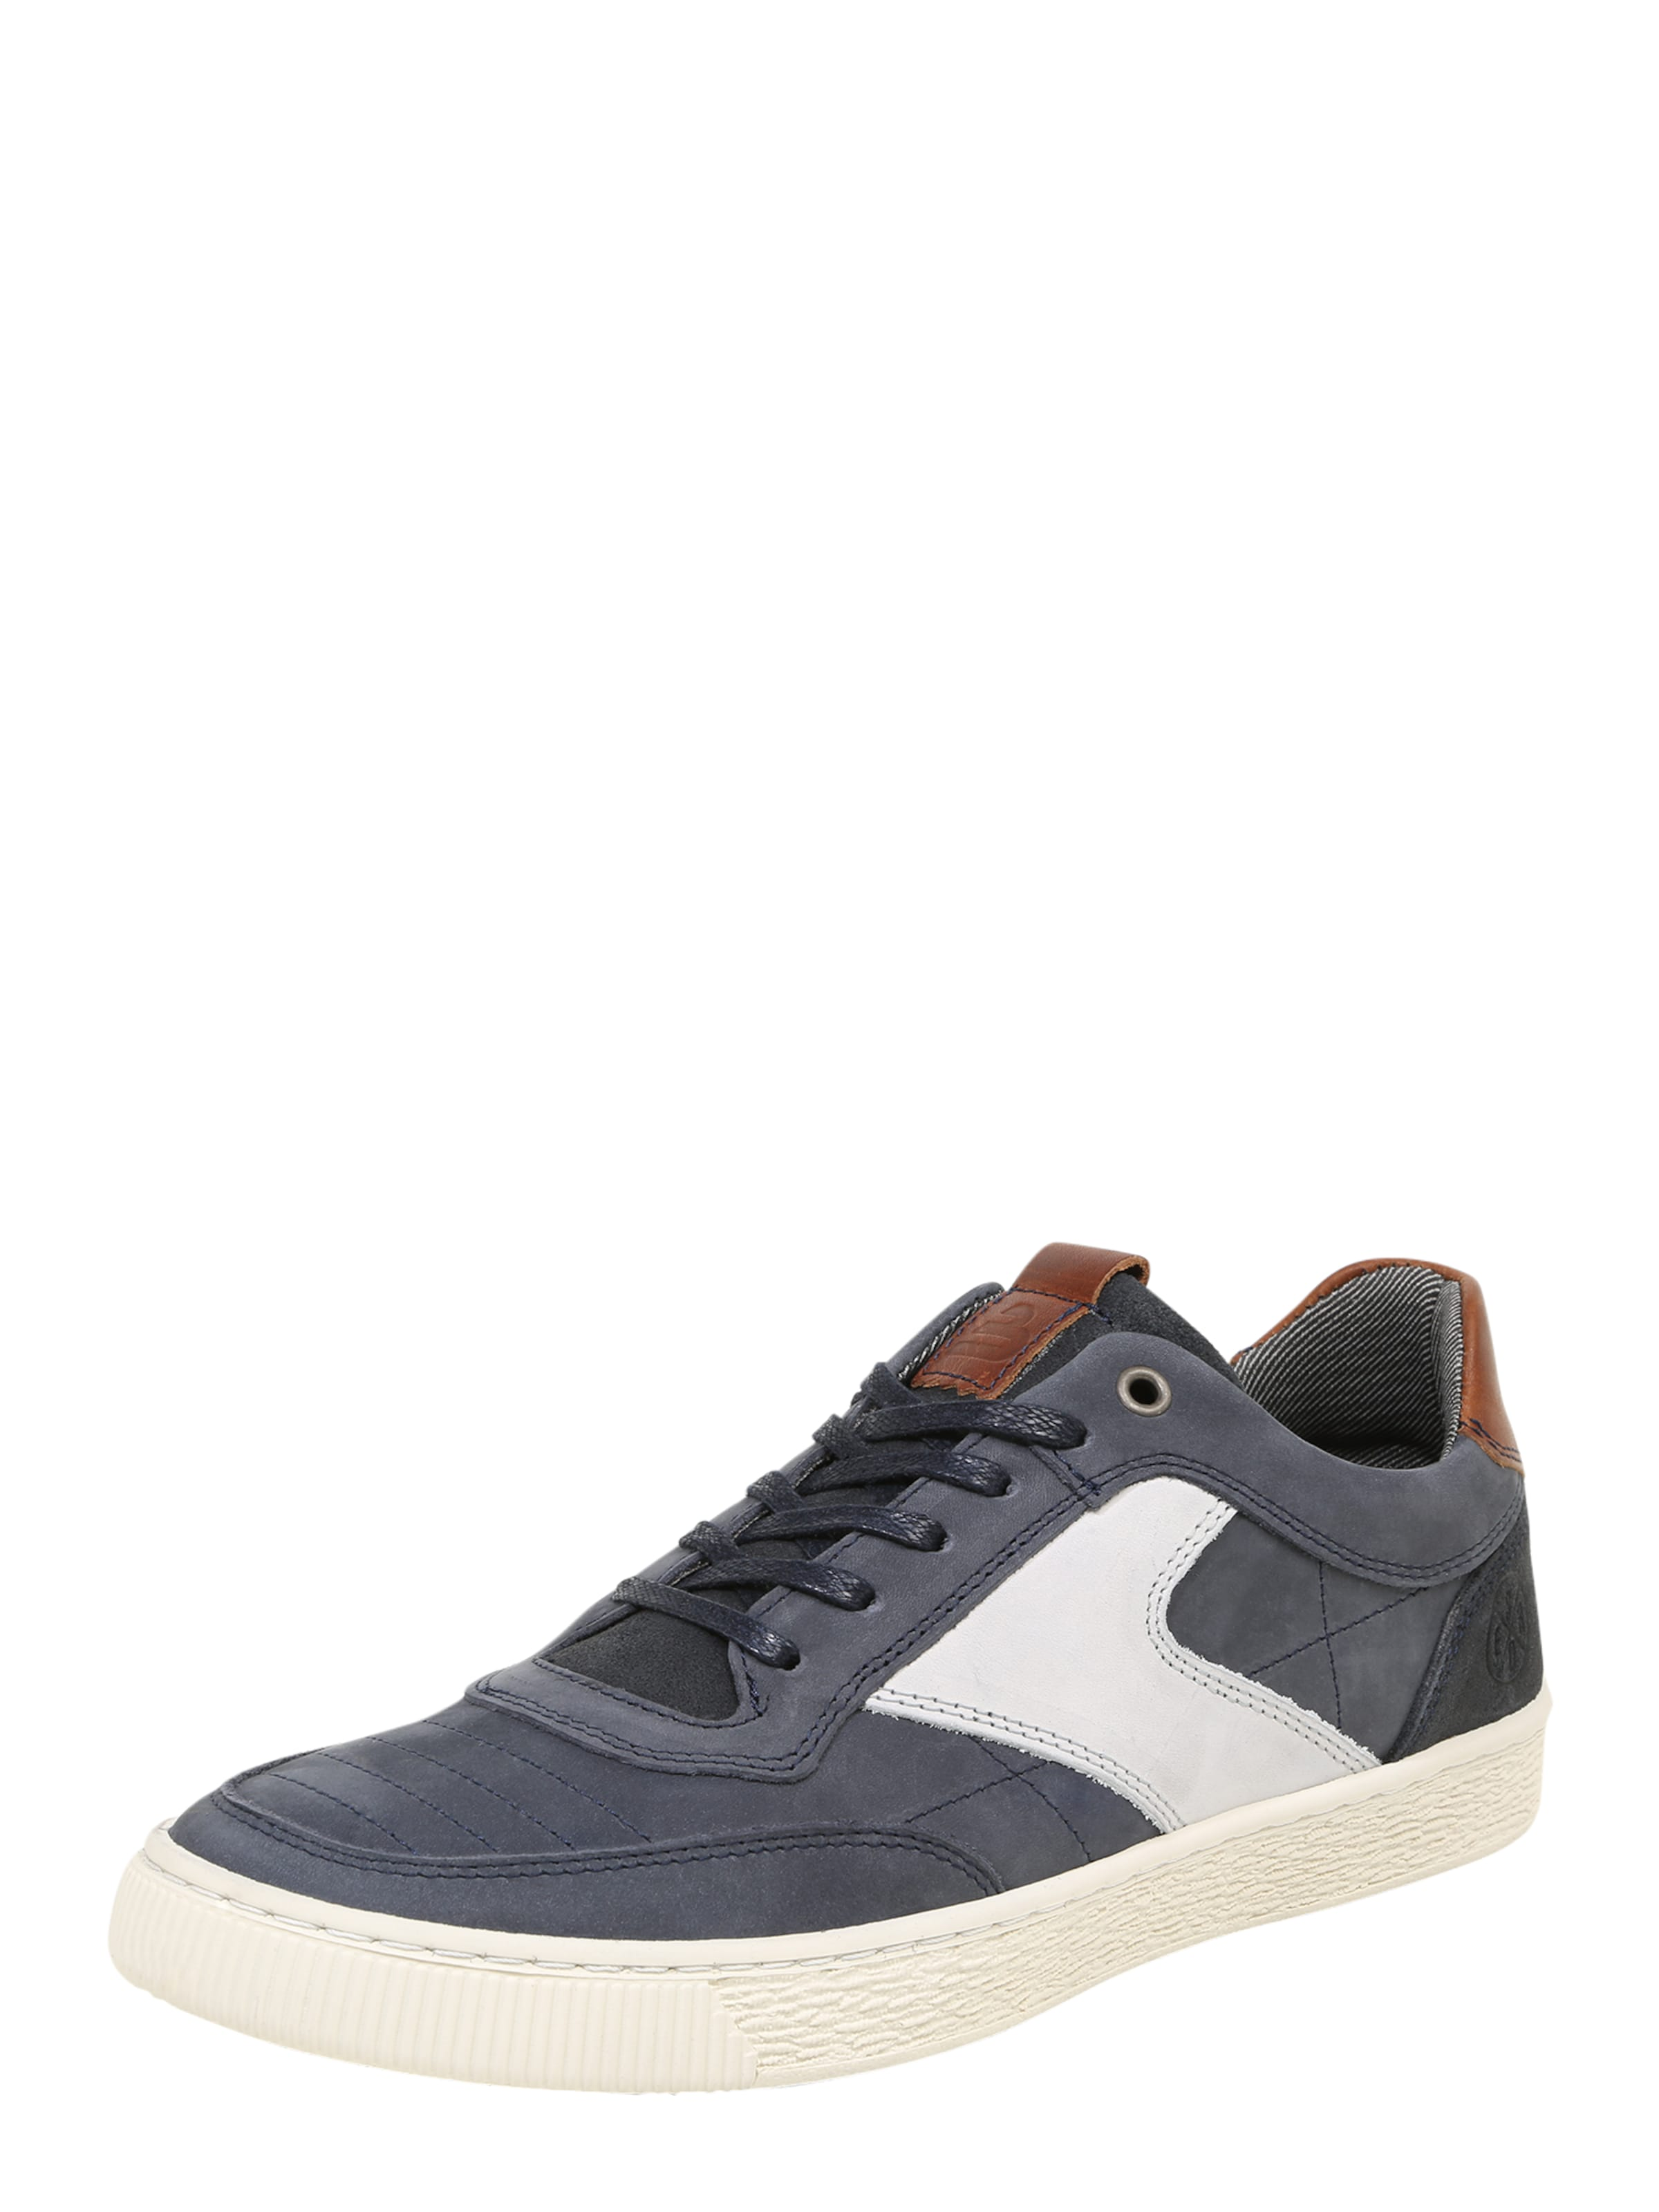 Haltbare Mode billige Schuhe BULLBOXER | Hochwertige Sneaker Schuhe Gut getragene Schuhe